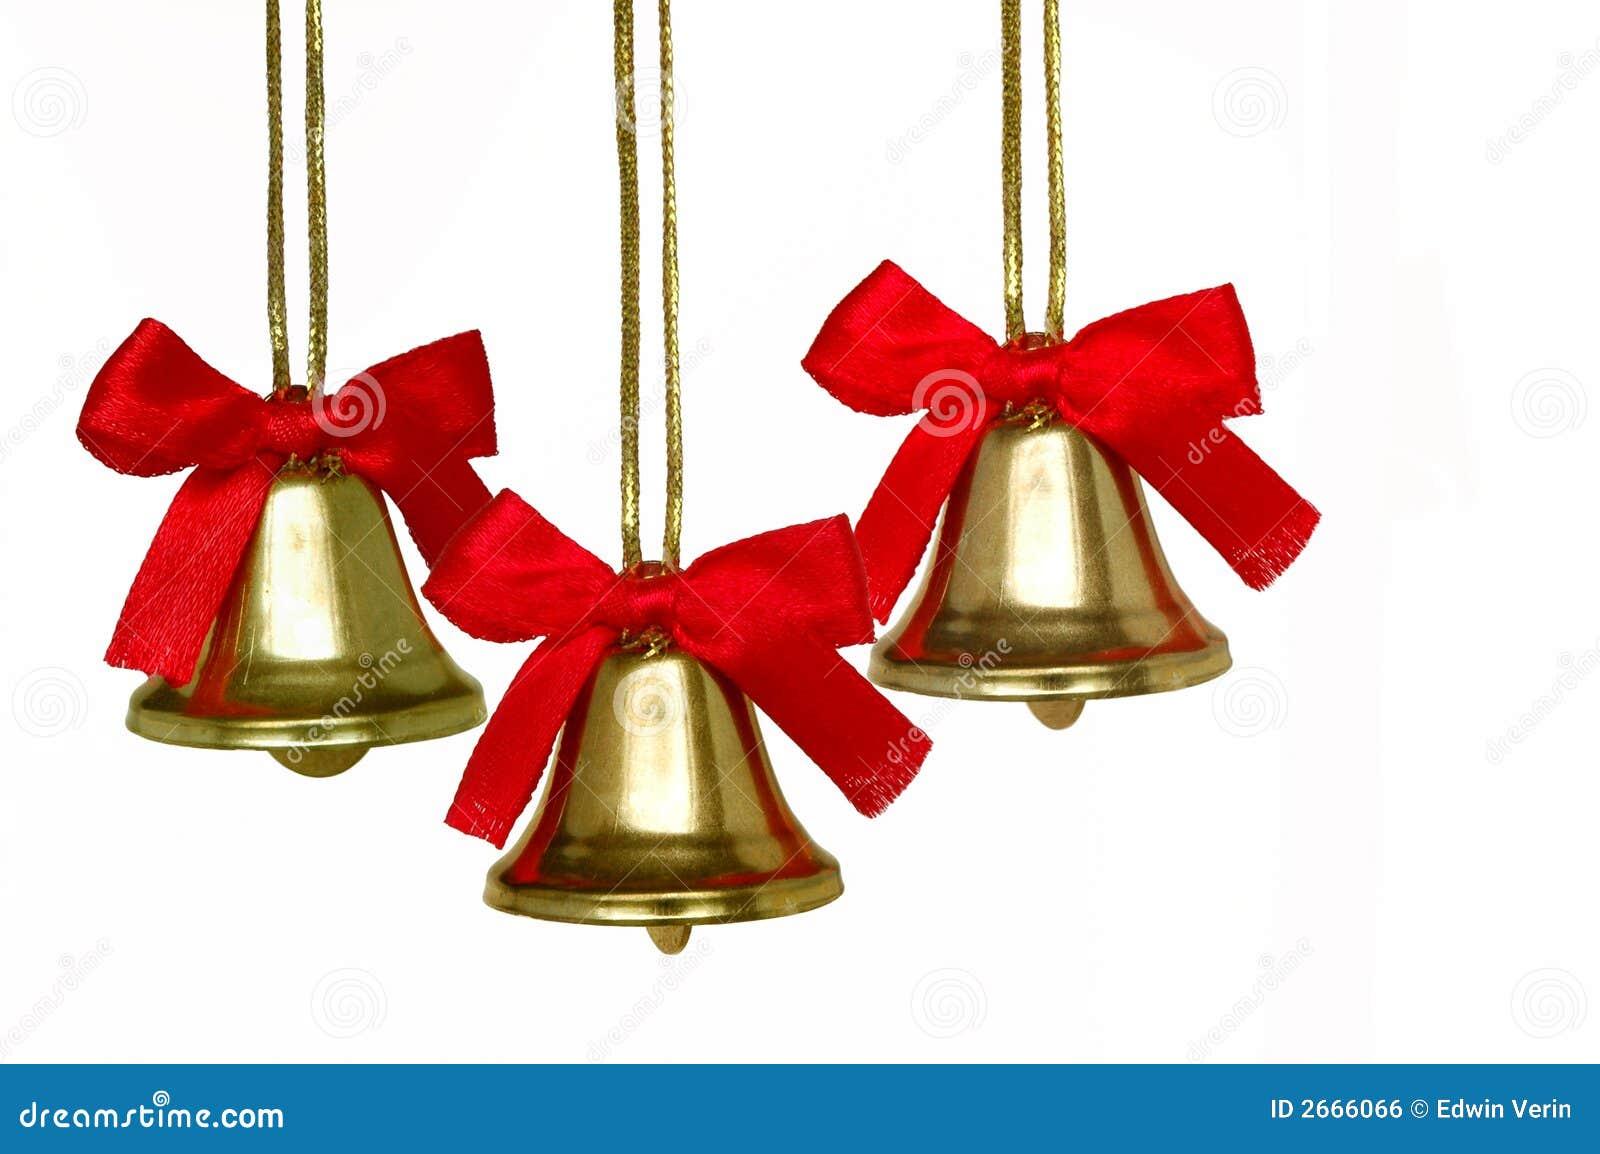 Bell christmas ornament - Christmas Bells